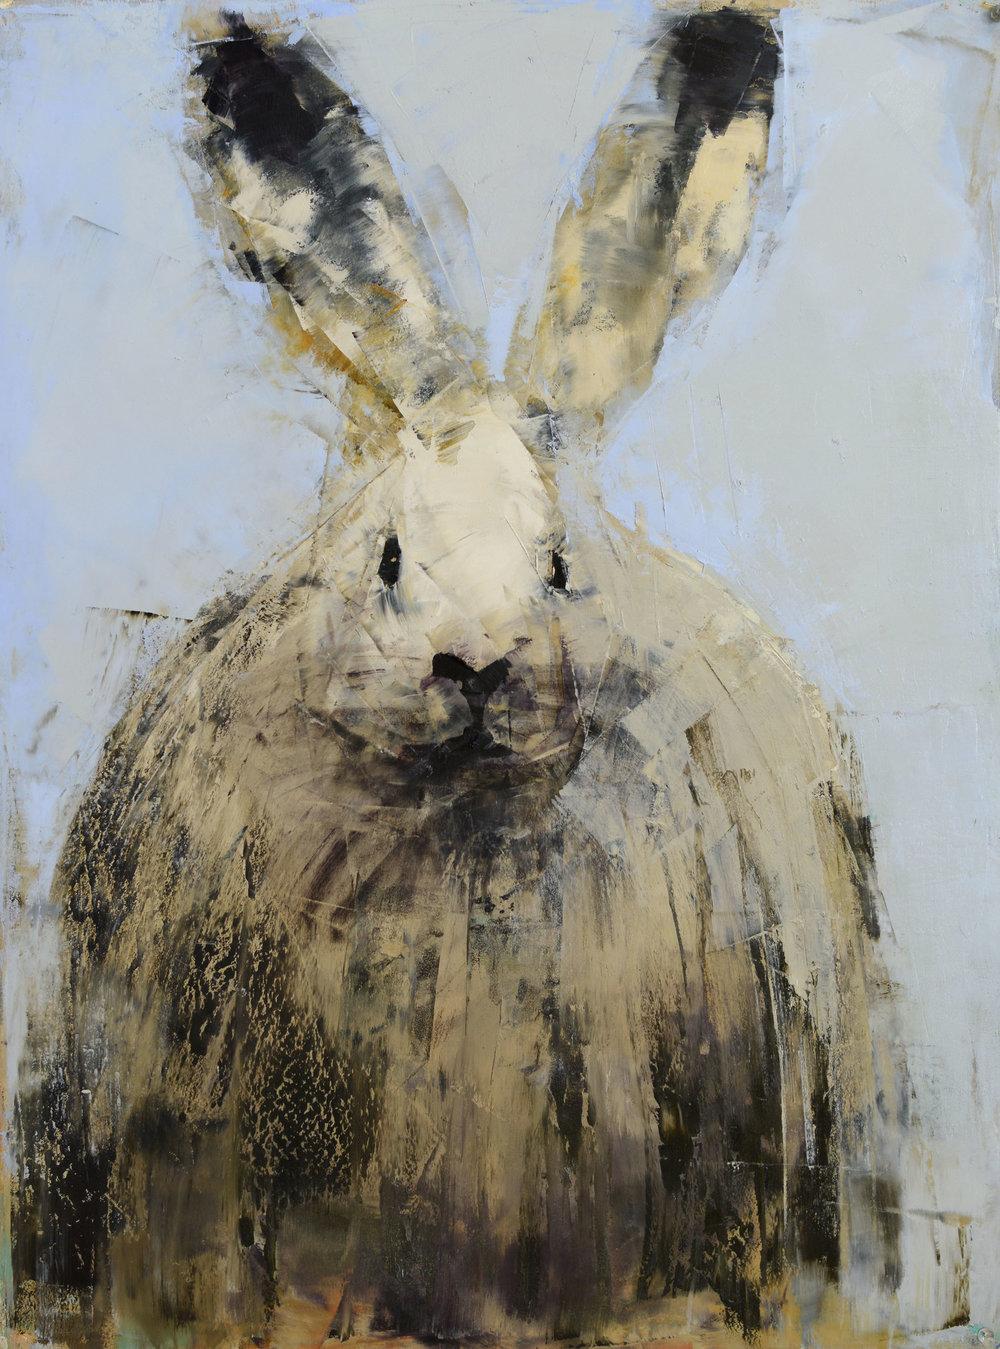 Arctic+Hare+no.+2_30+x+22.5.jpg